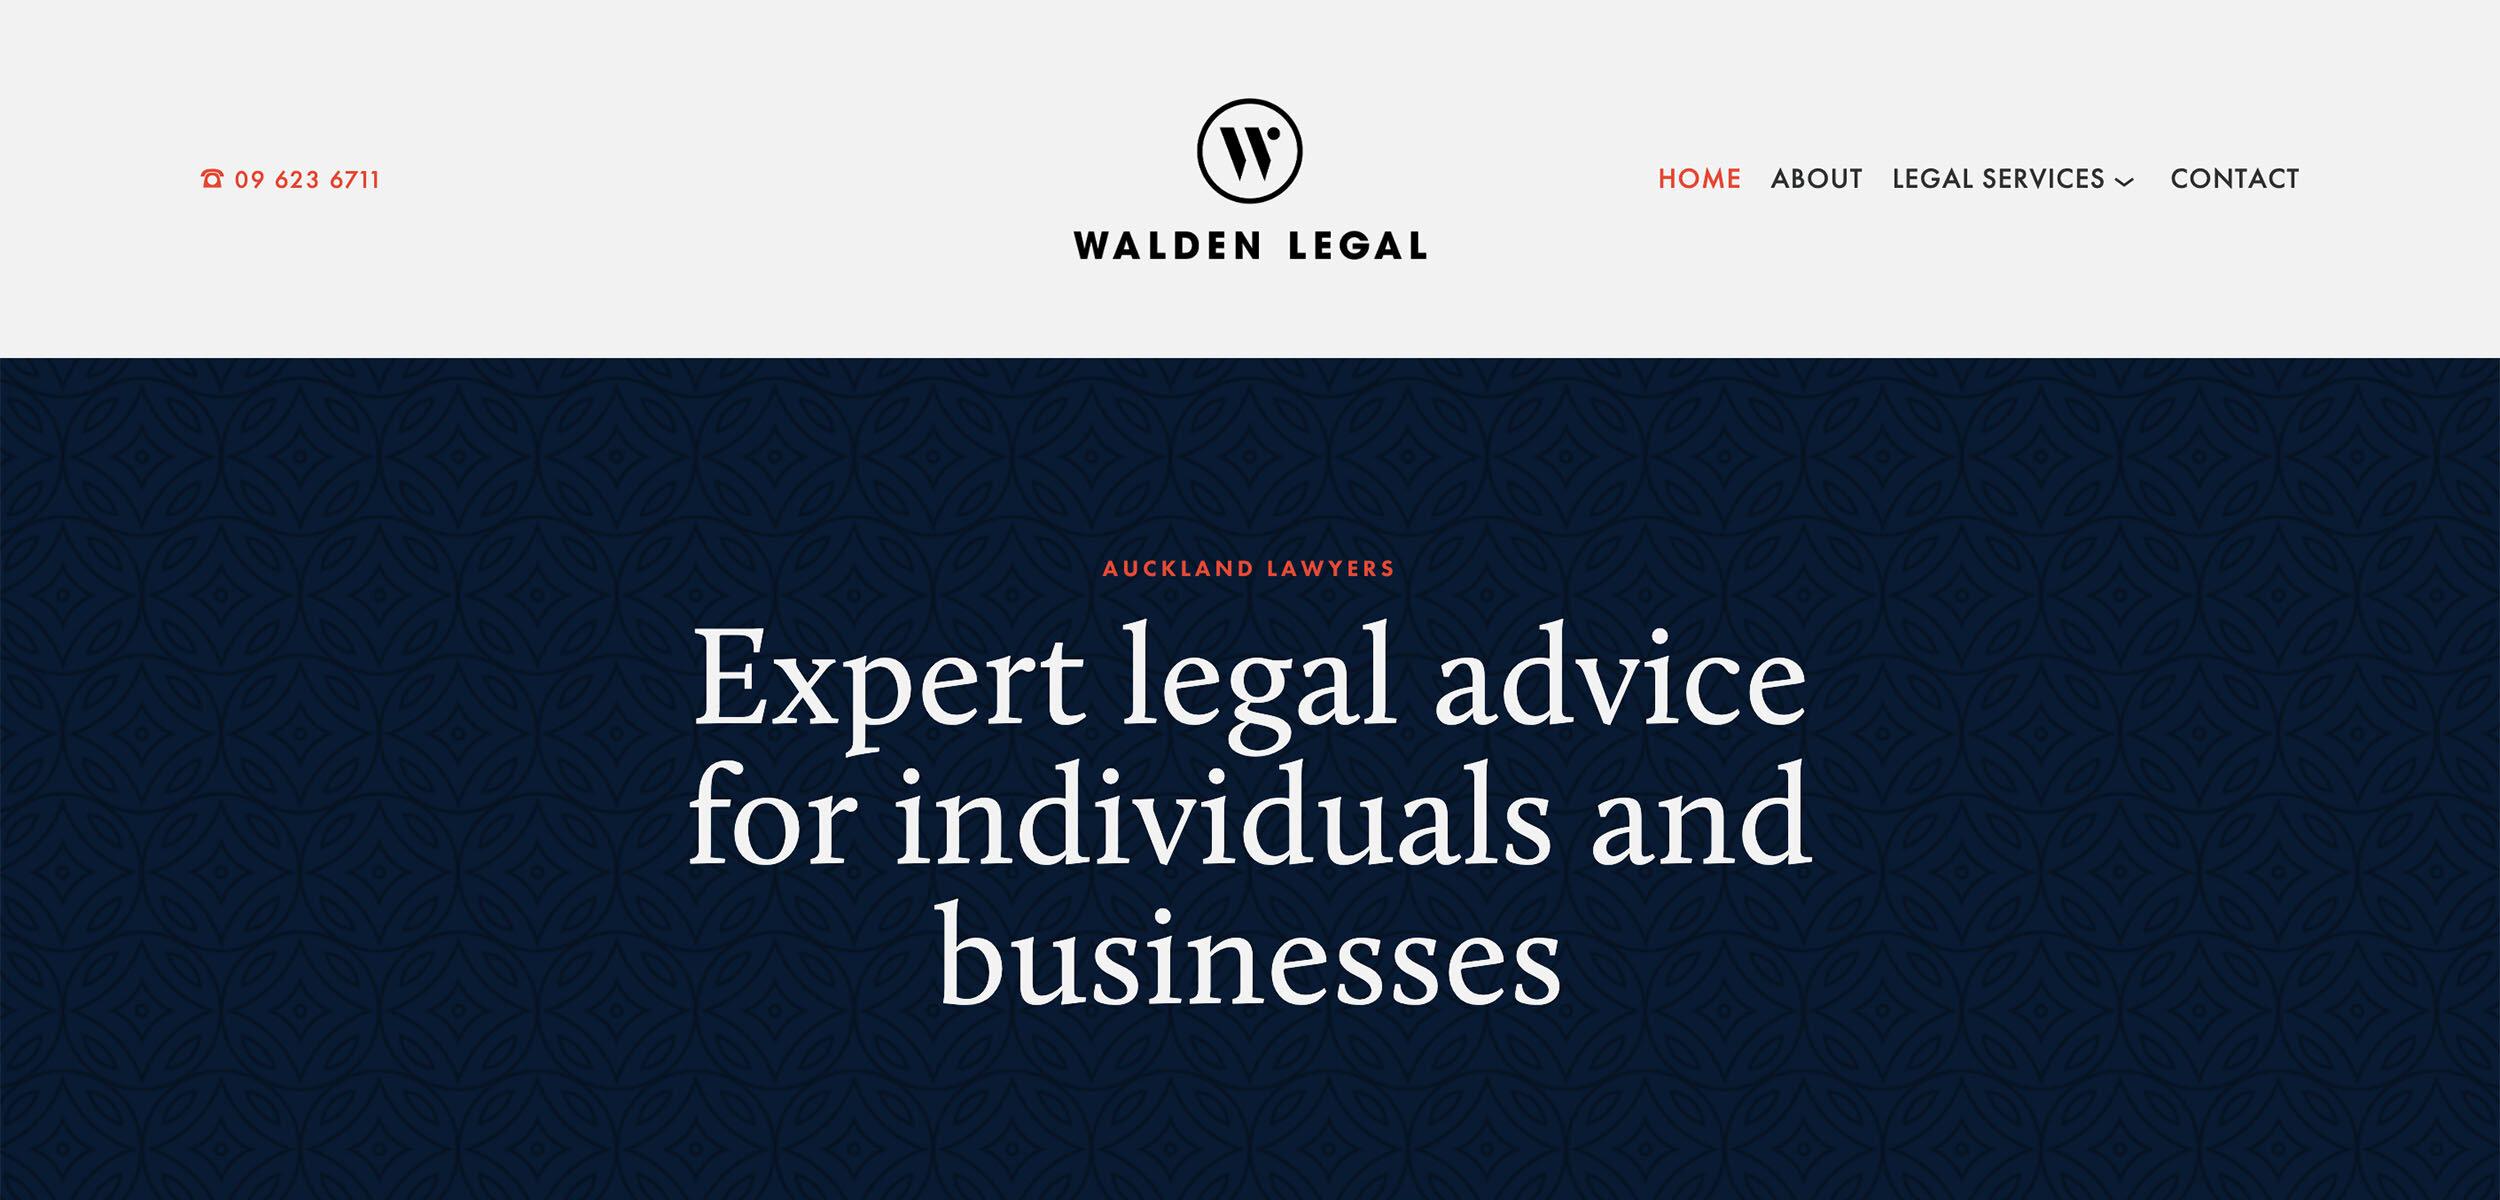 walden-screengrab.jpg